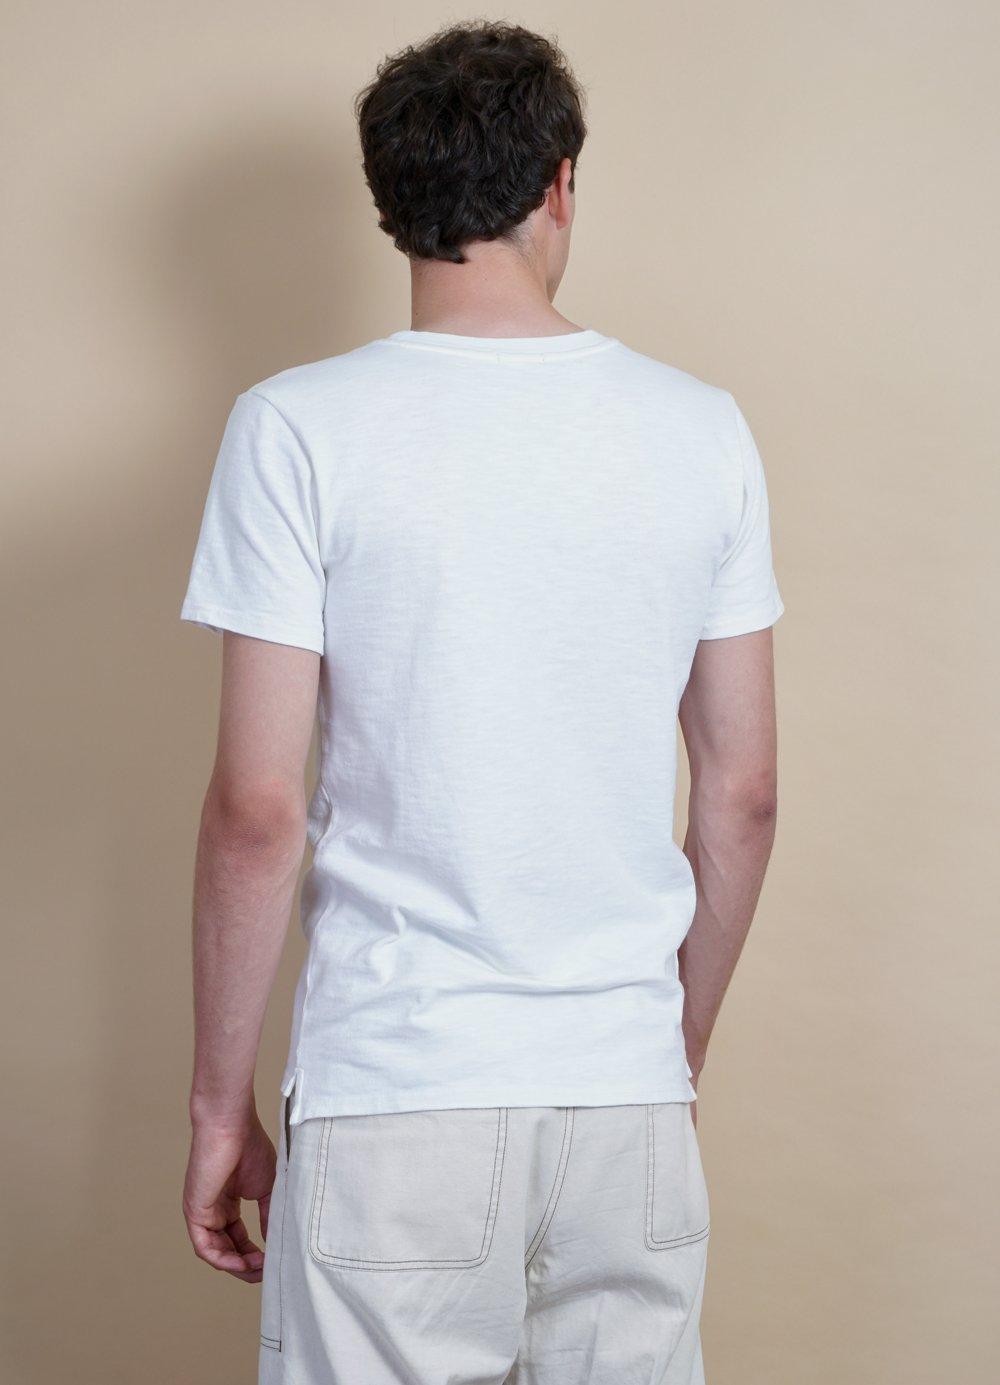 Hansen Garments JAMES | Slub Yarn Pocket T | var. colors